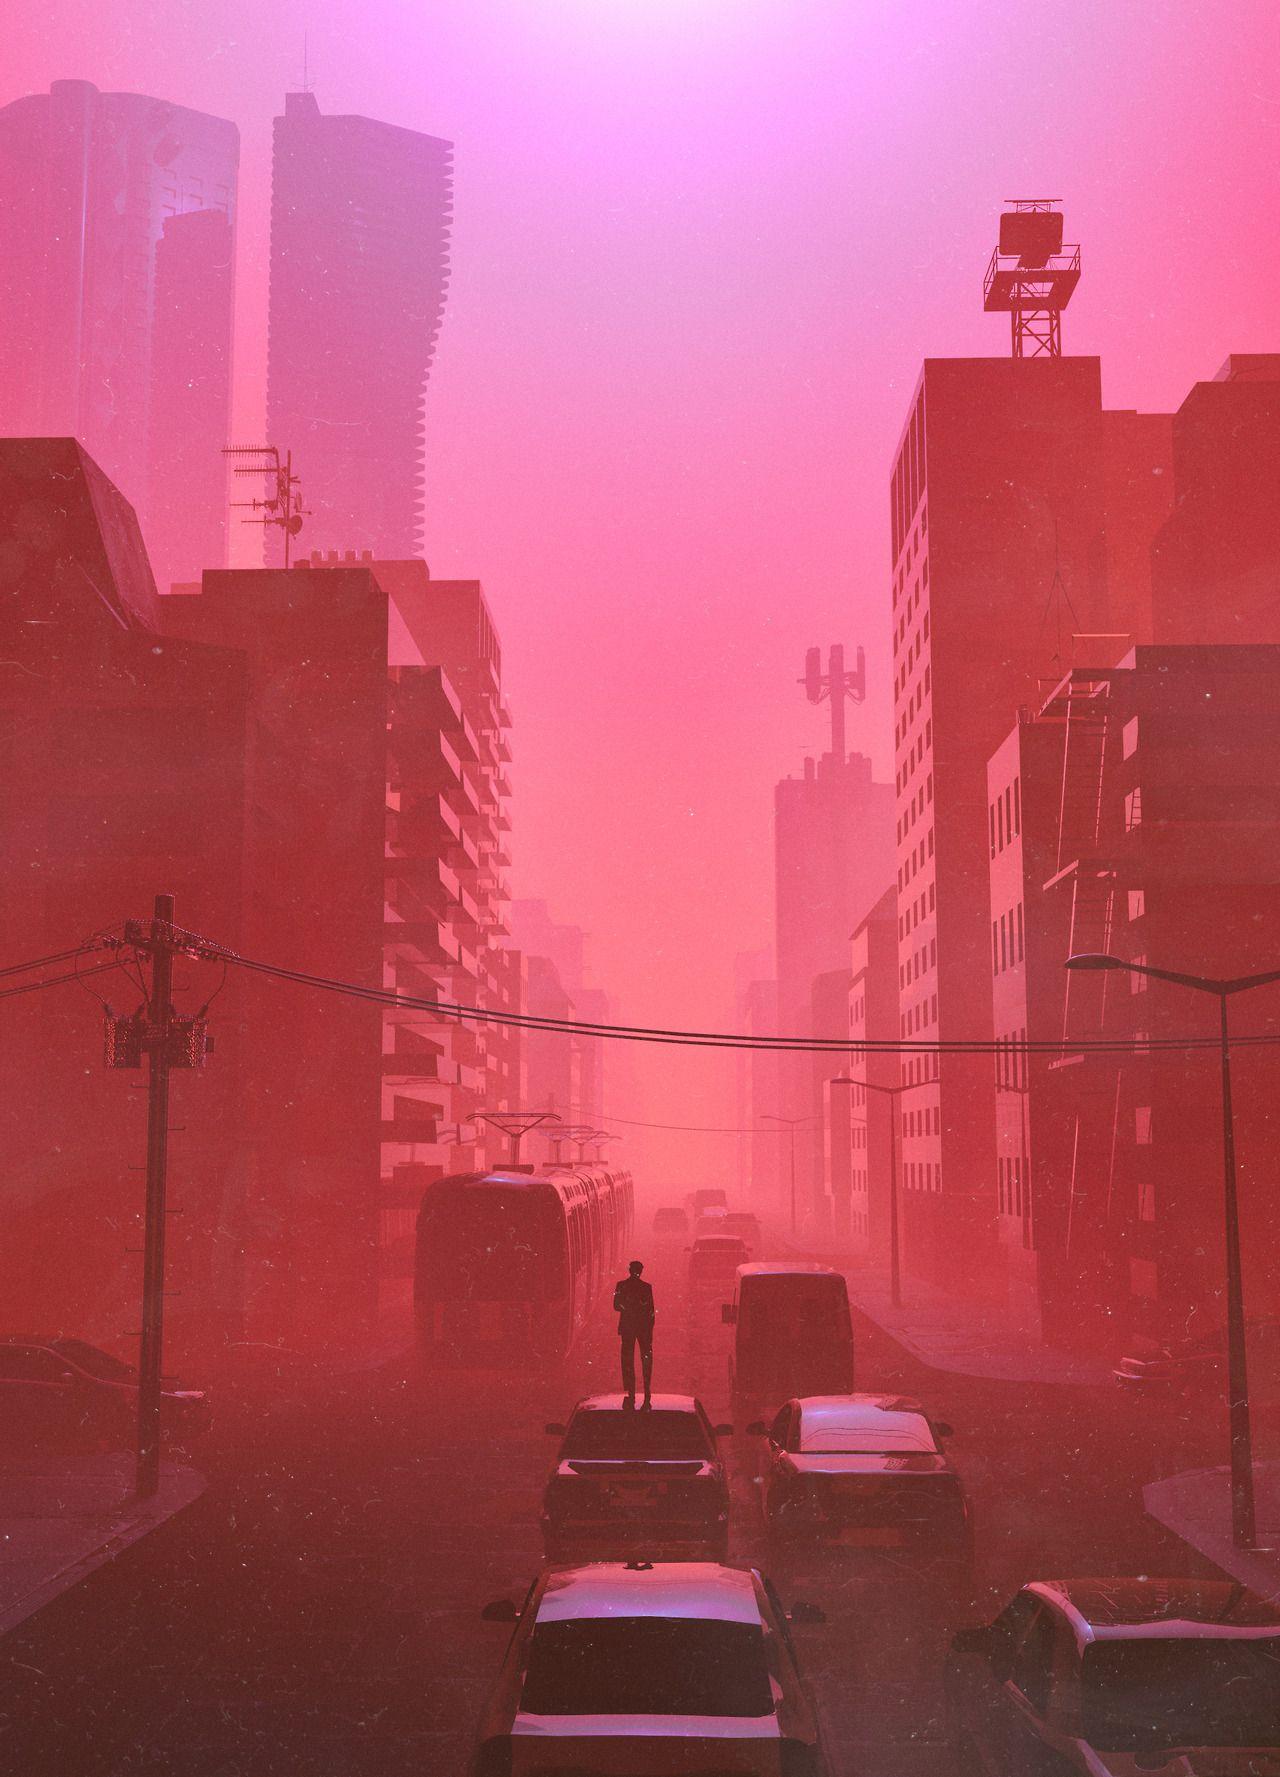 BEEPLE | MMNTO in 2019 | Vaporwave art, Red aesthetic, Photo art